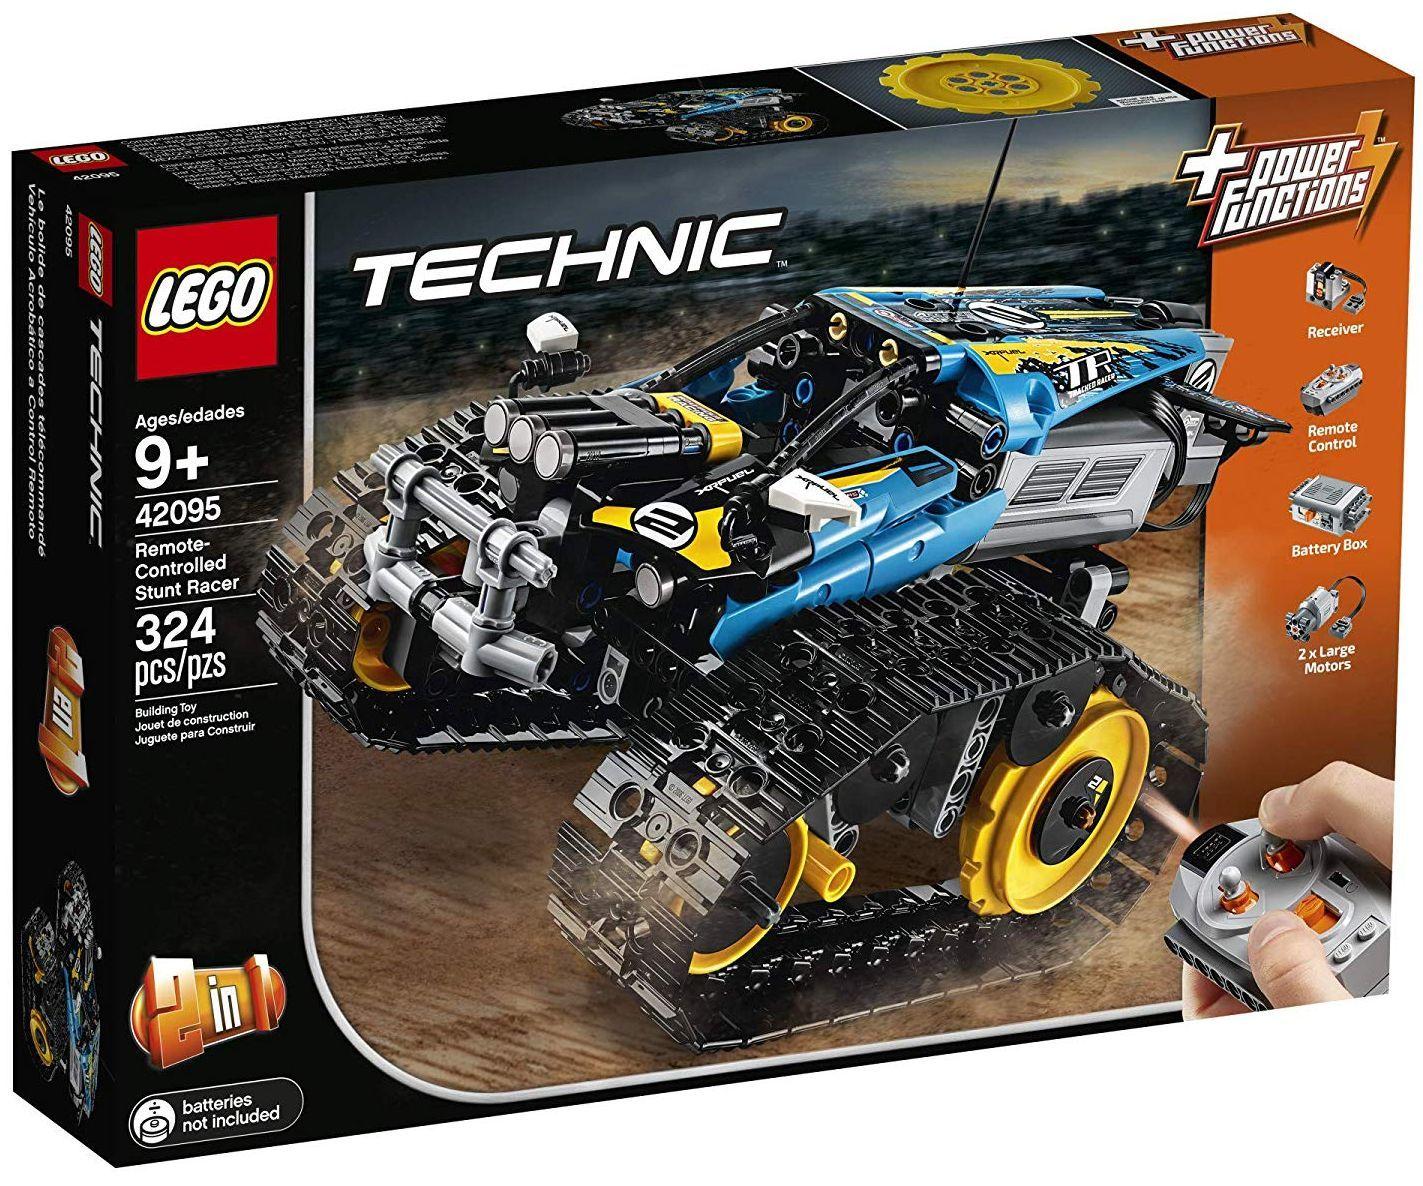 Конструктор Lego Technic - Каскадьорска кола, с дистанционно управление (42095) - 1